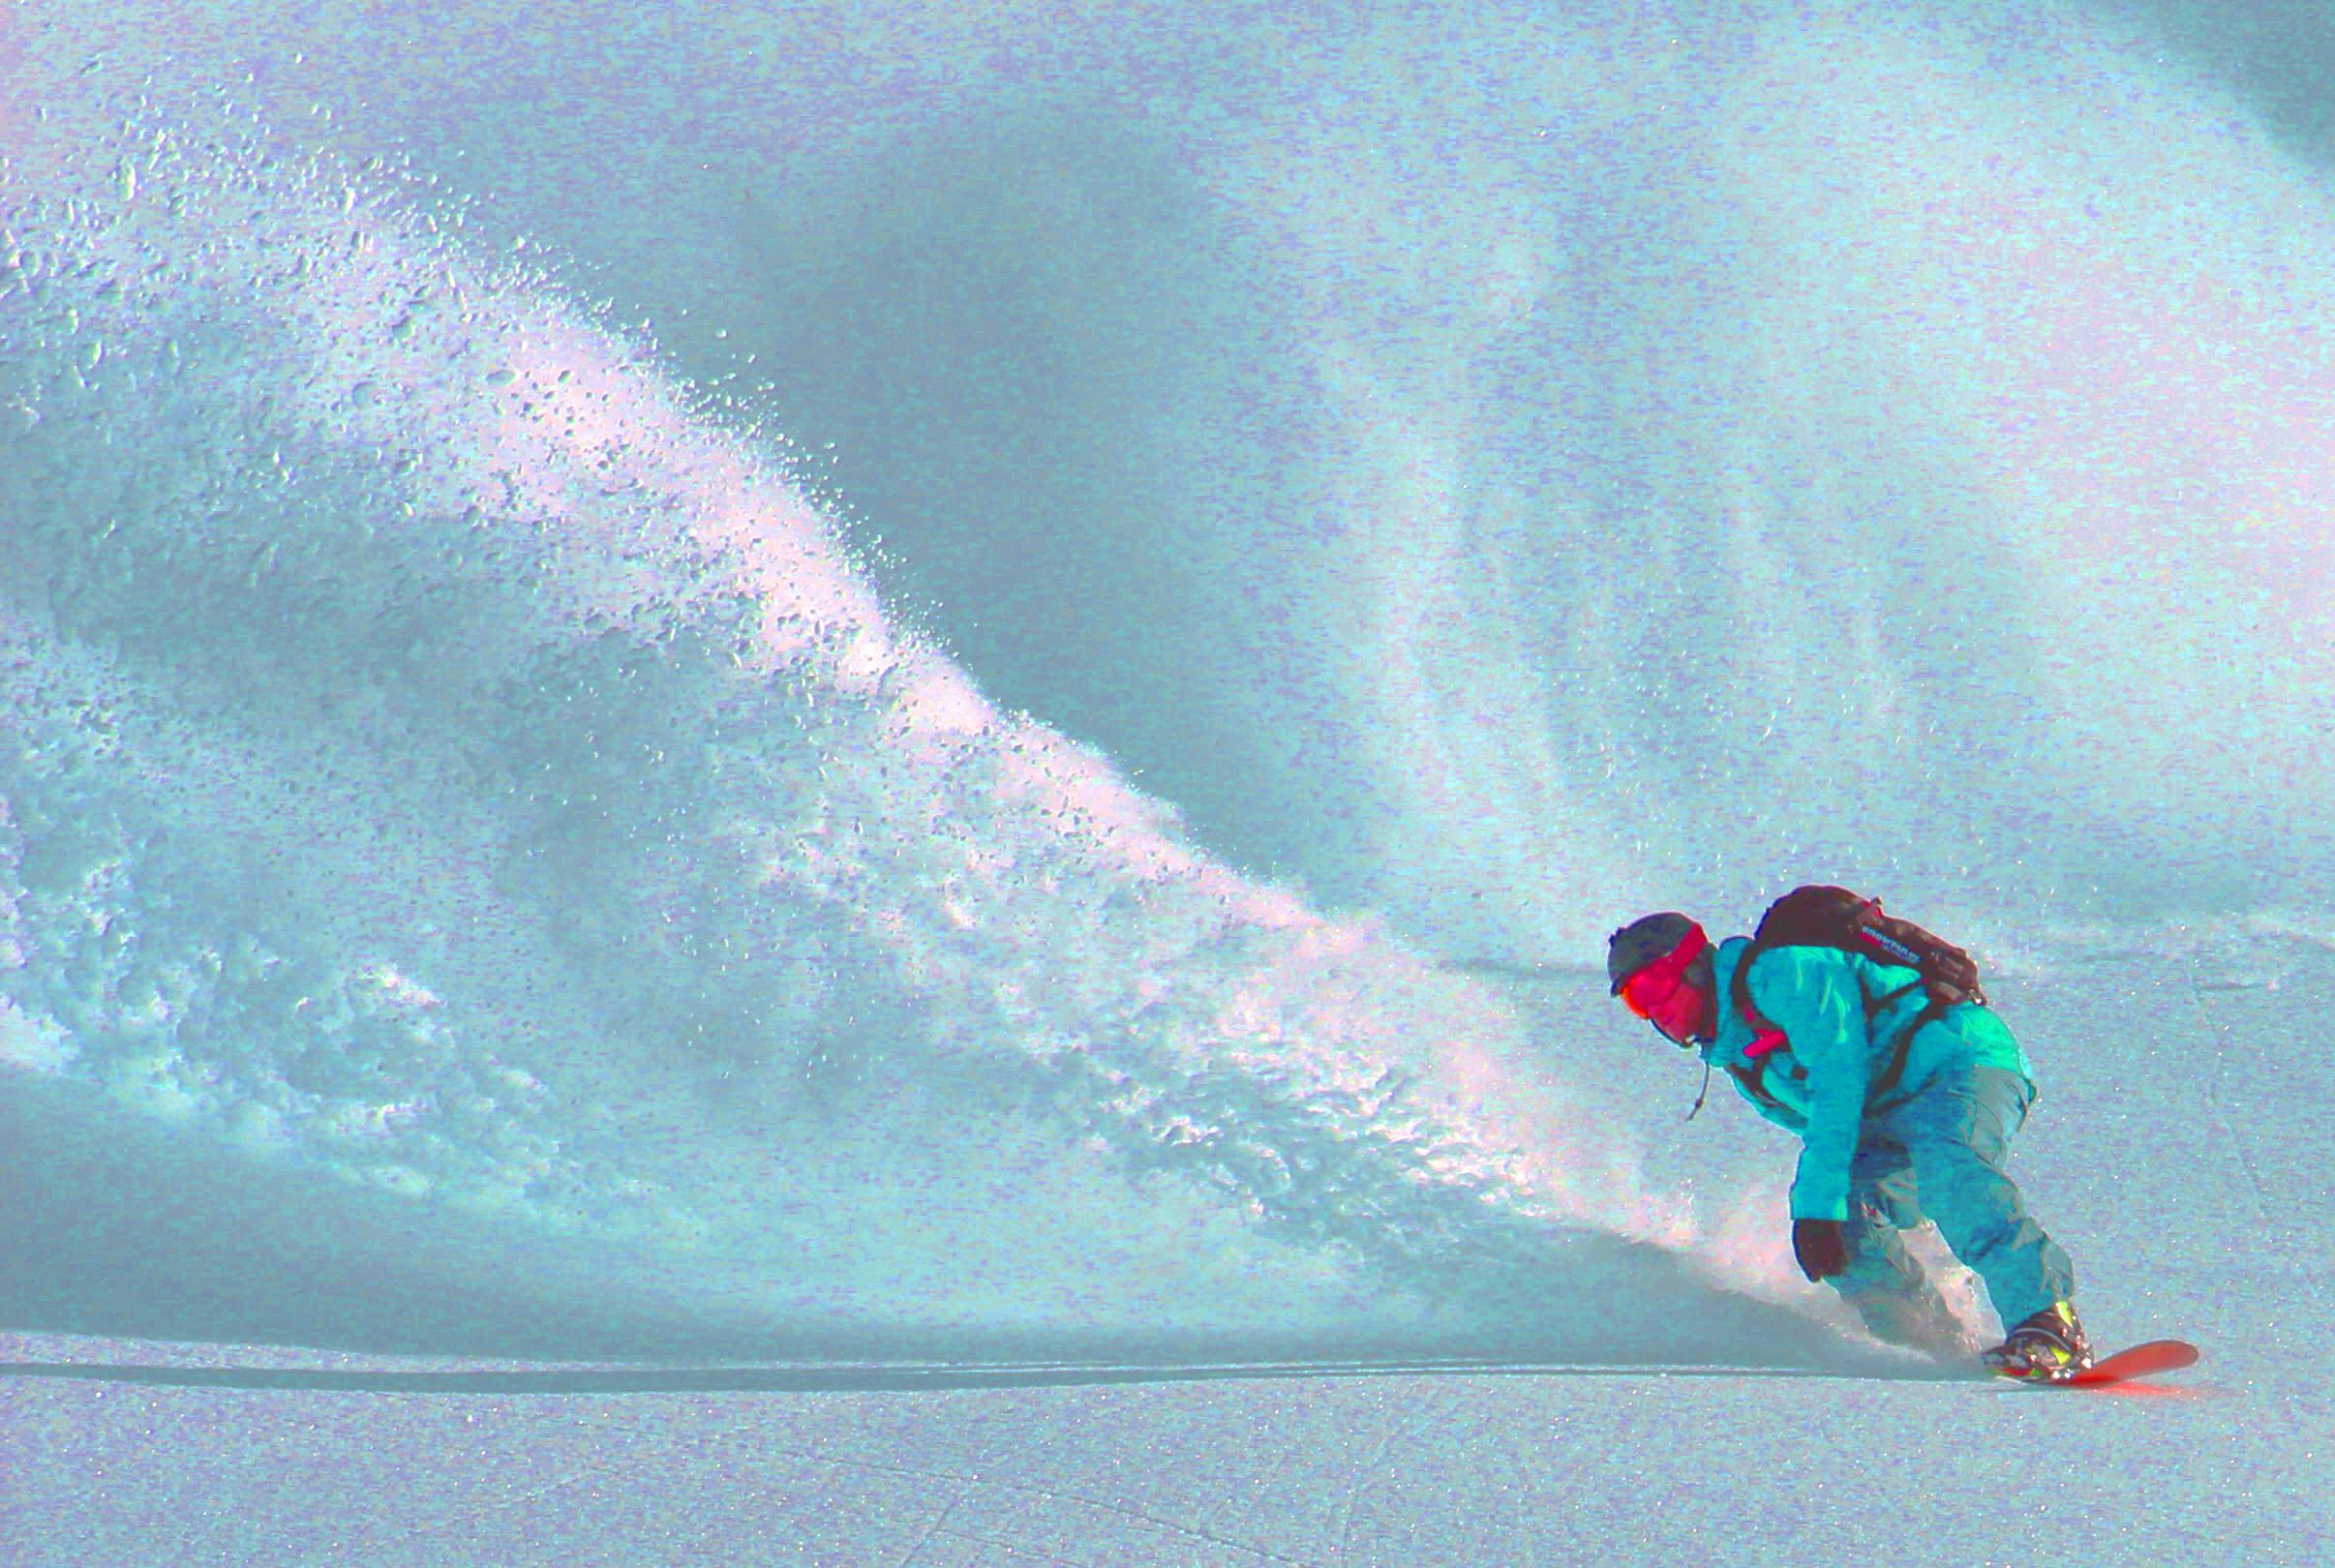 ski fiml photos -2.jpg